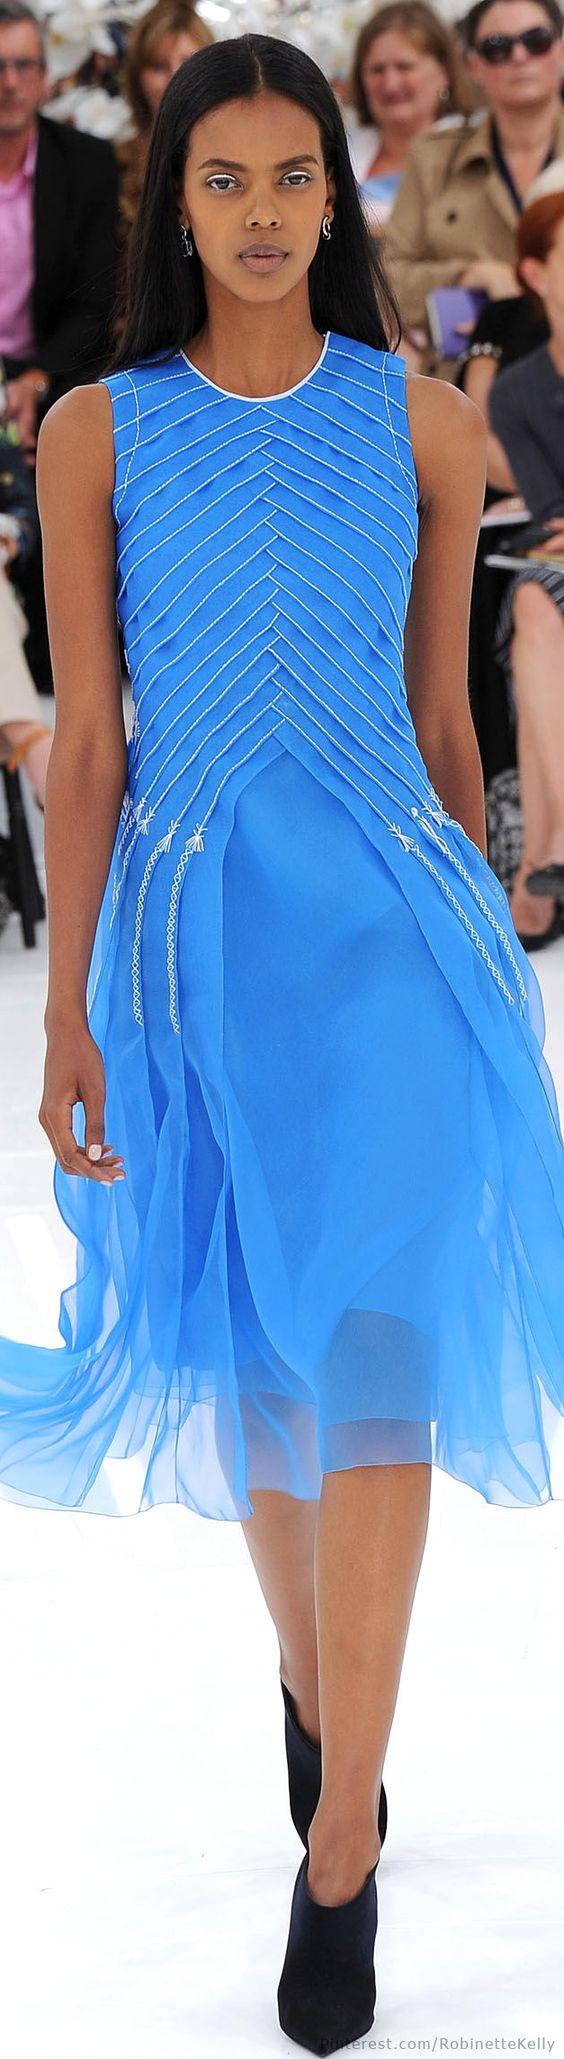 Farb- und Stilberatung mit www.farben-reich.com # Christian Dior Haute Couture ♥✤